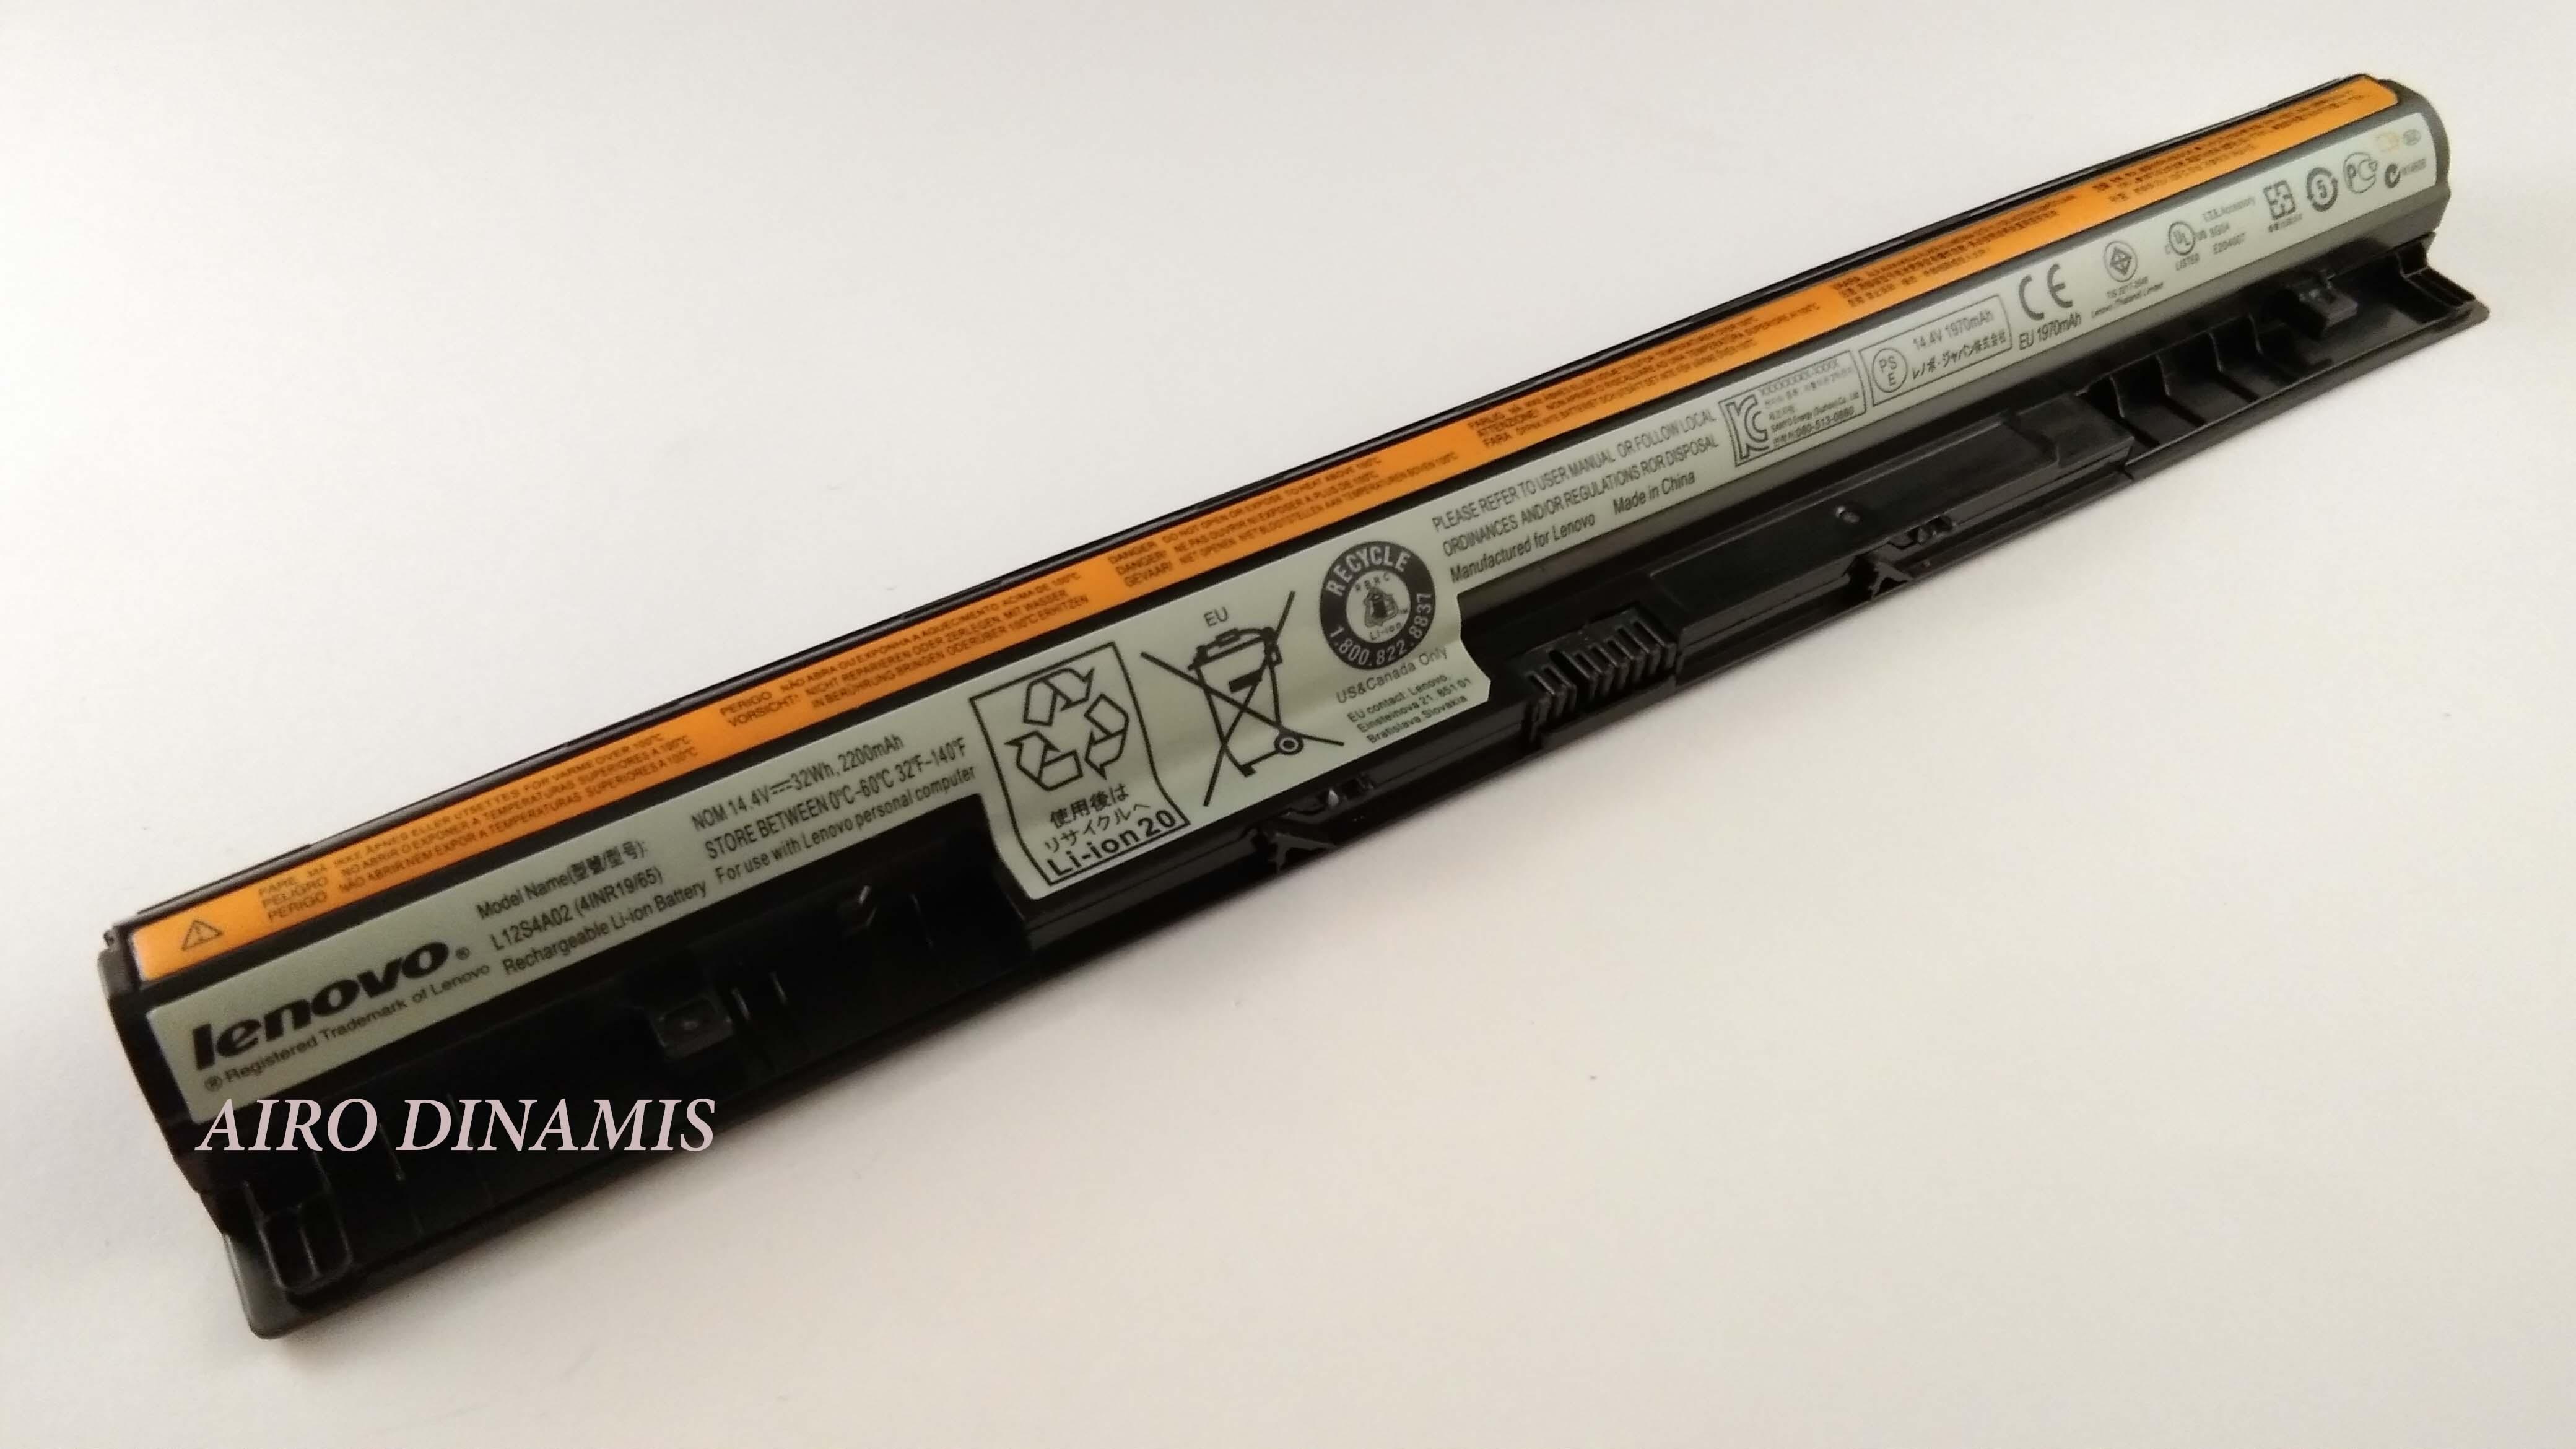 Baterai Laptop Original Lenovo IdeaPad Touch G400s G405s G500s G505s G40 G40-30 G40-45 G40-70 G40-80 G50-45 Z40-70 L12S4A02